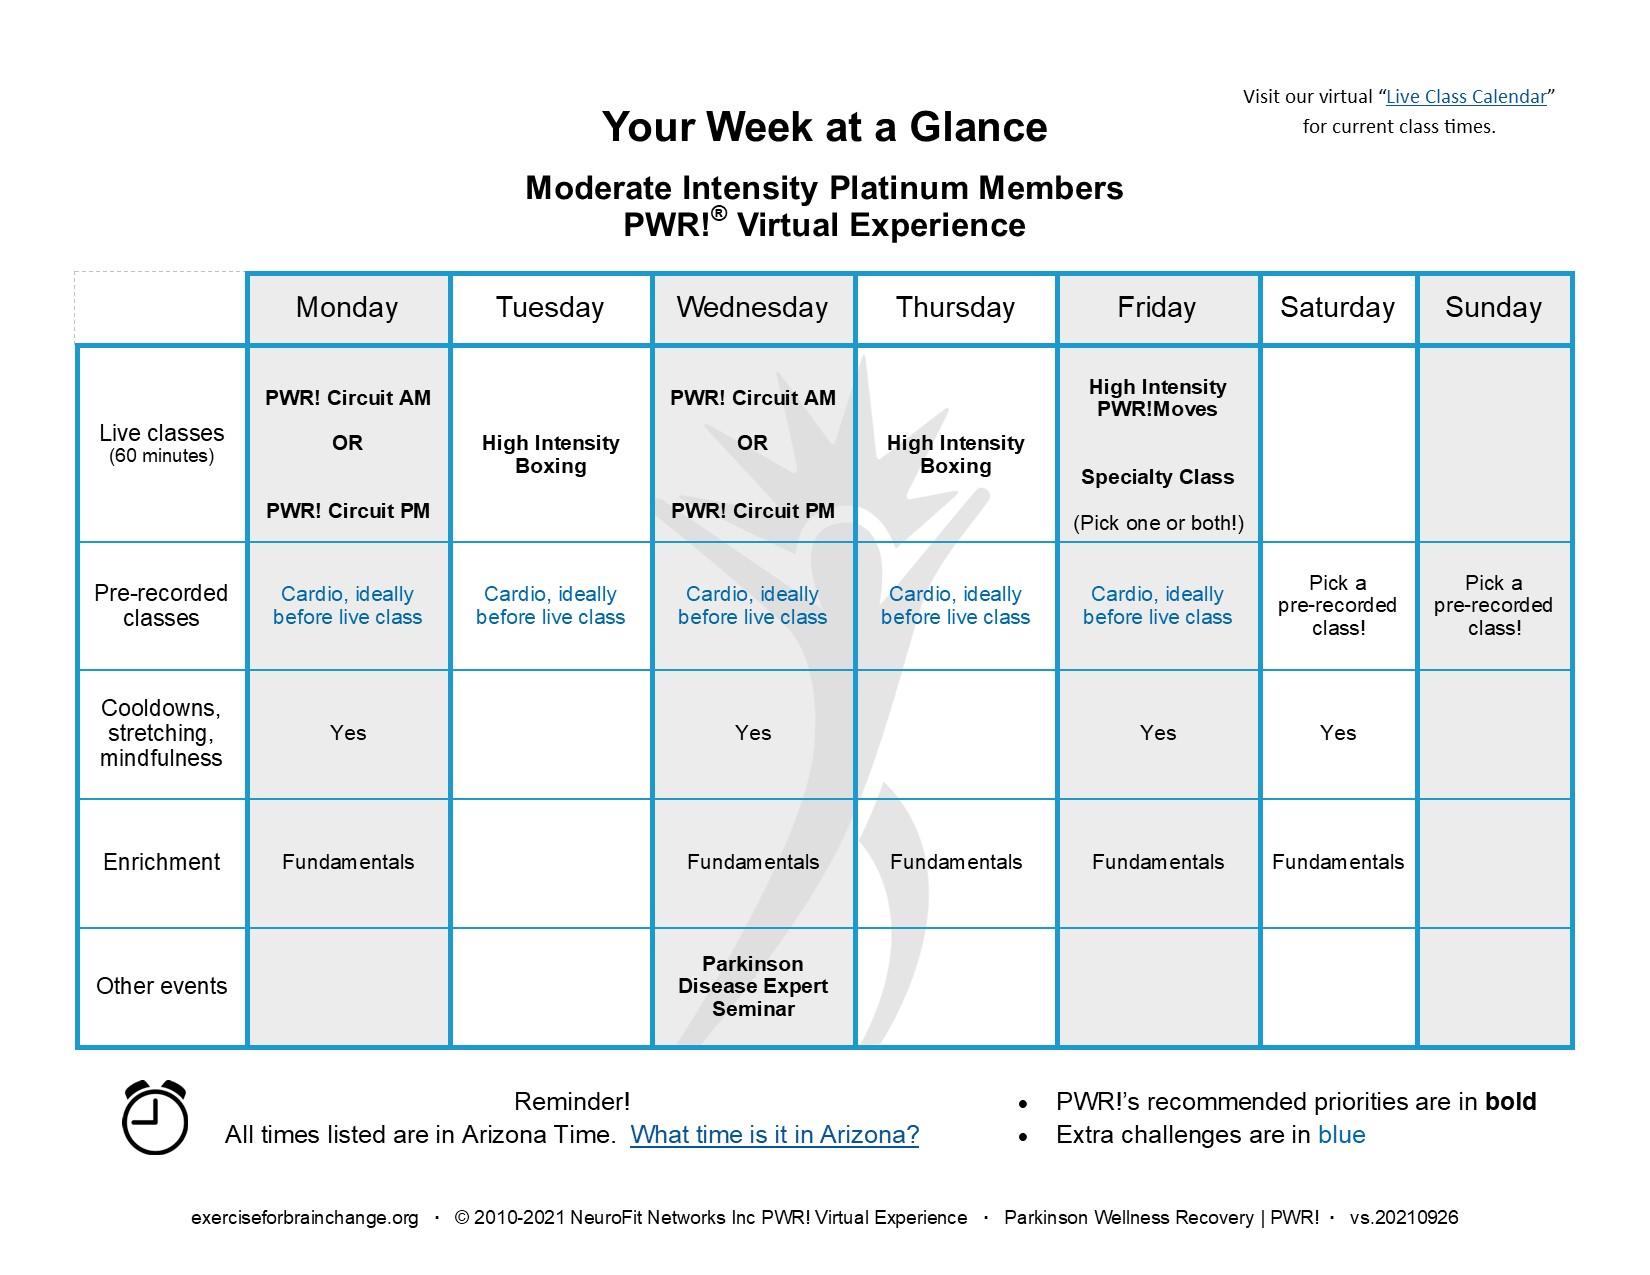 Week_at_a_Glance_Moderate_Platinum_AM_PM_notimes